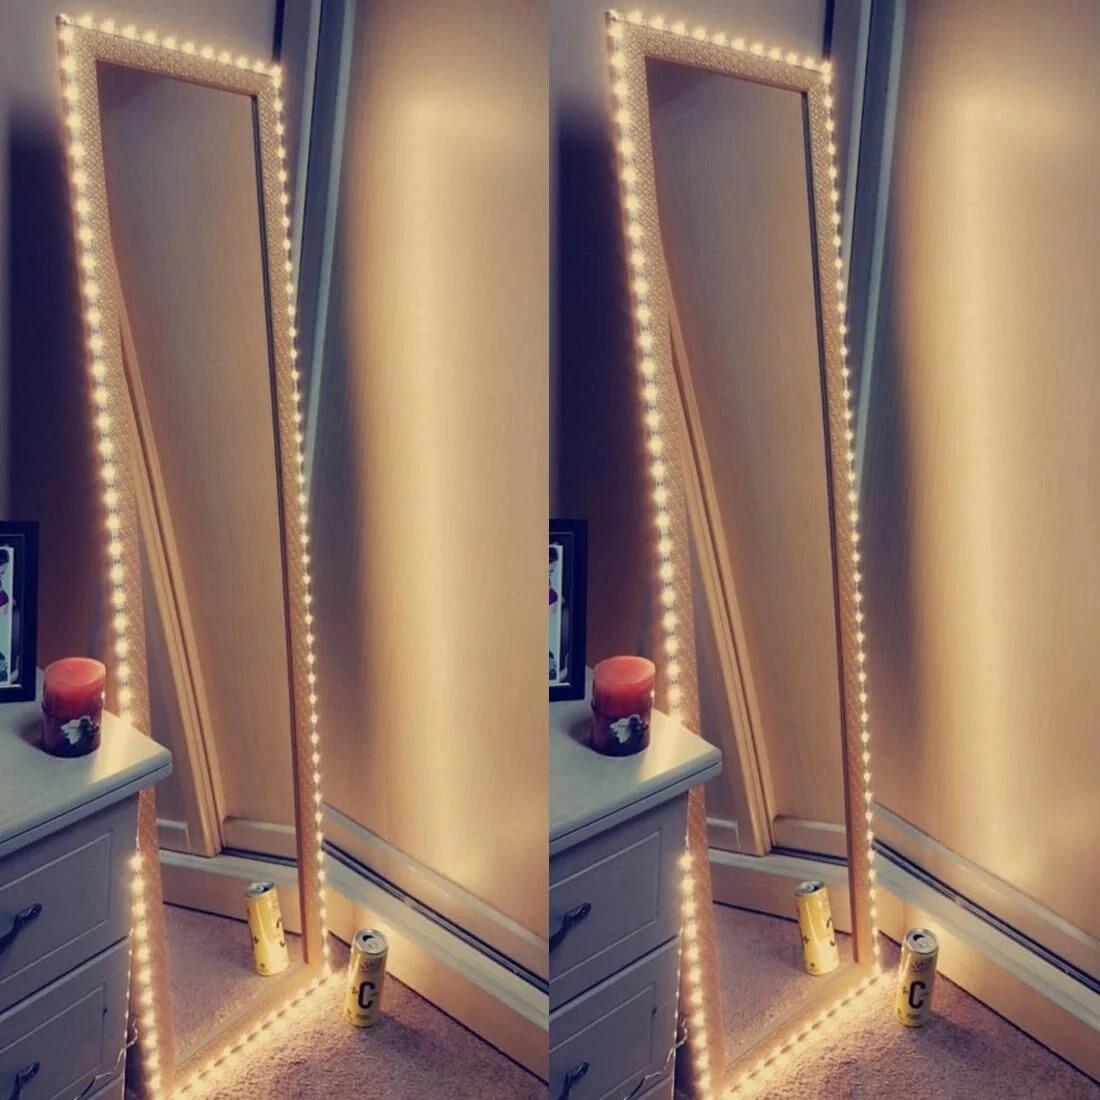 Mirror Makeup Vanity Light 5v Usb Flexible Led Light For Mirror Diy Makeup Light For Tv Backlight 1m 5m Kitchen Desk Decor Light Vanity Lights Aliexpress